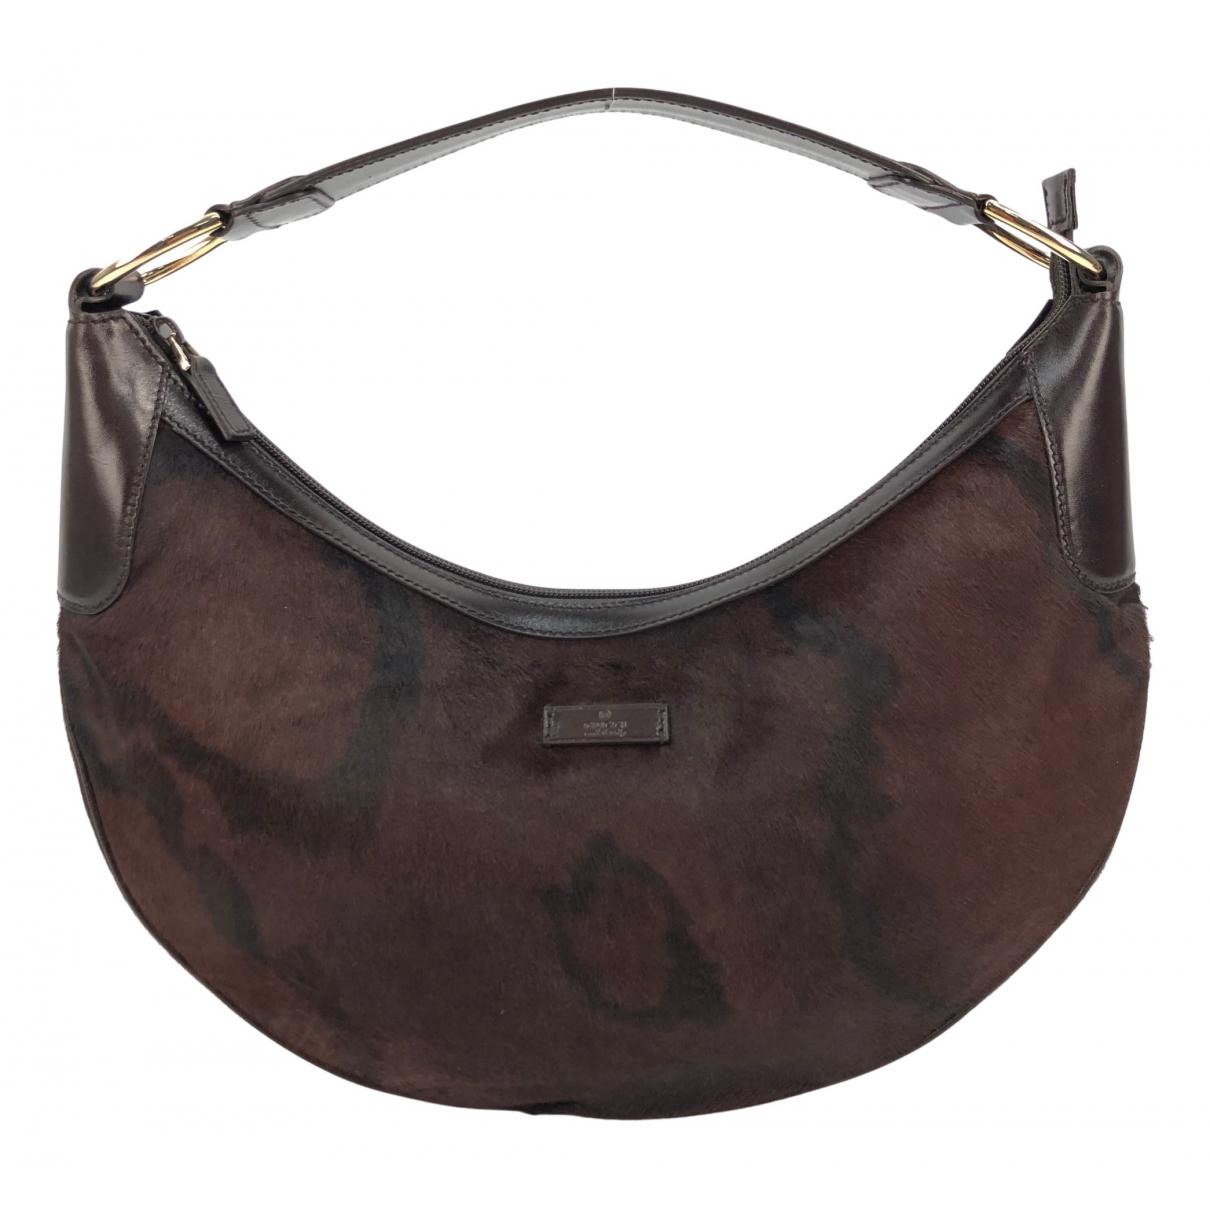 Gucci N Brown Pony-style calfskin handbag for Women N